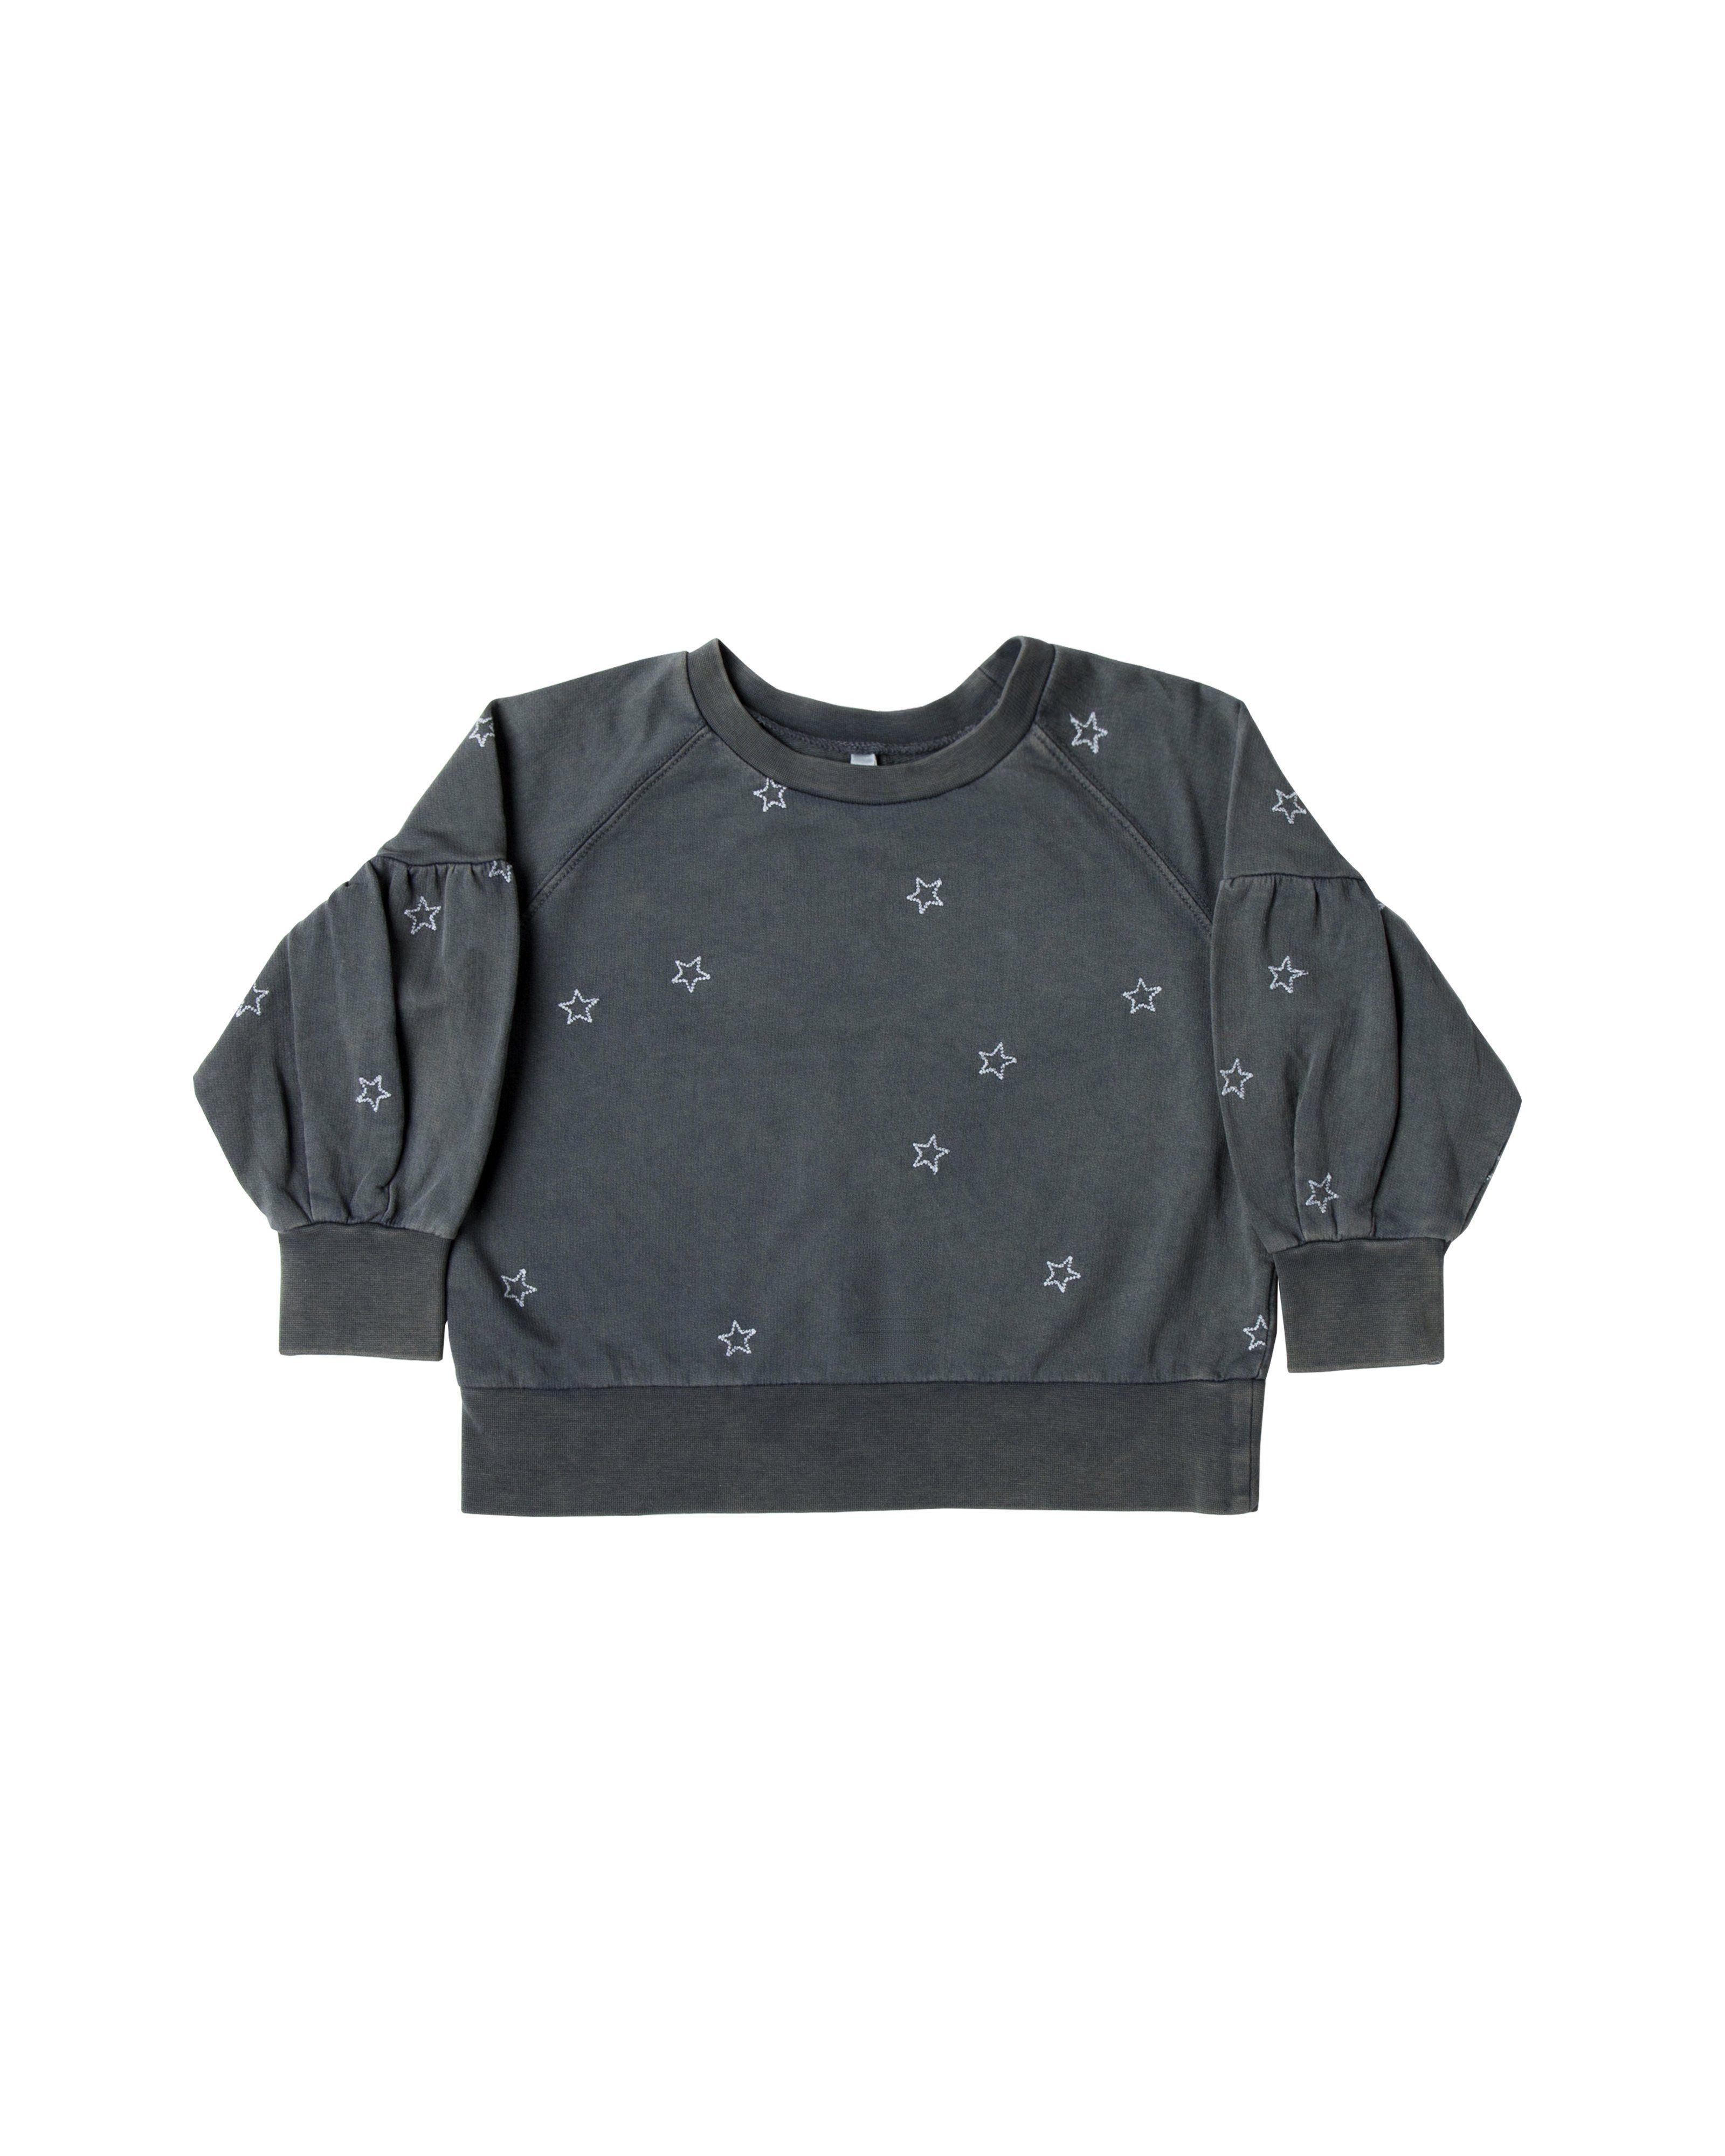 cdfa7dba015e Rylee and Cru Puff Sleeve Sweatshirt - Stars